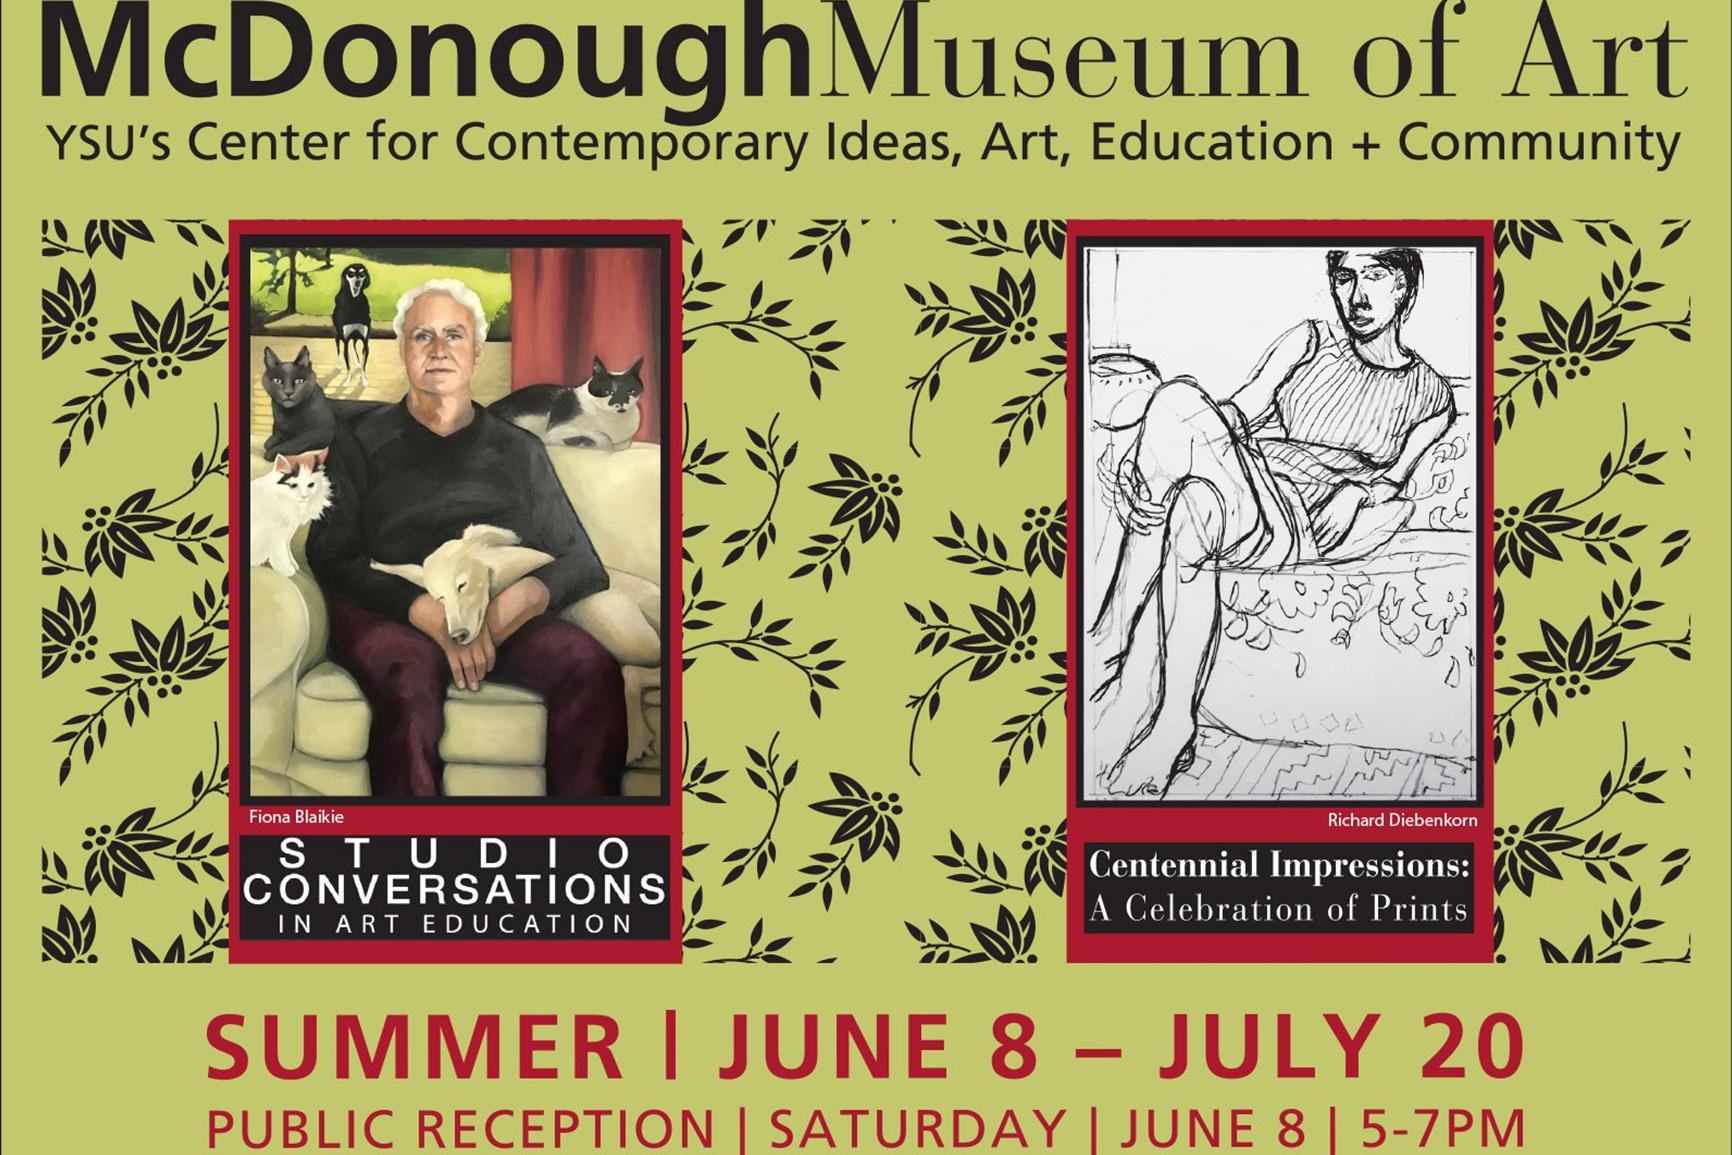 Summer Exhibitions